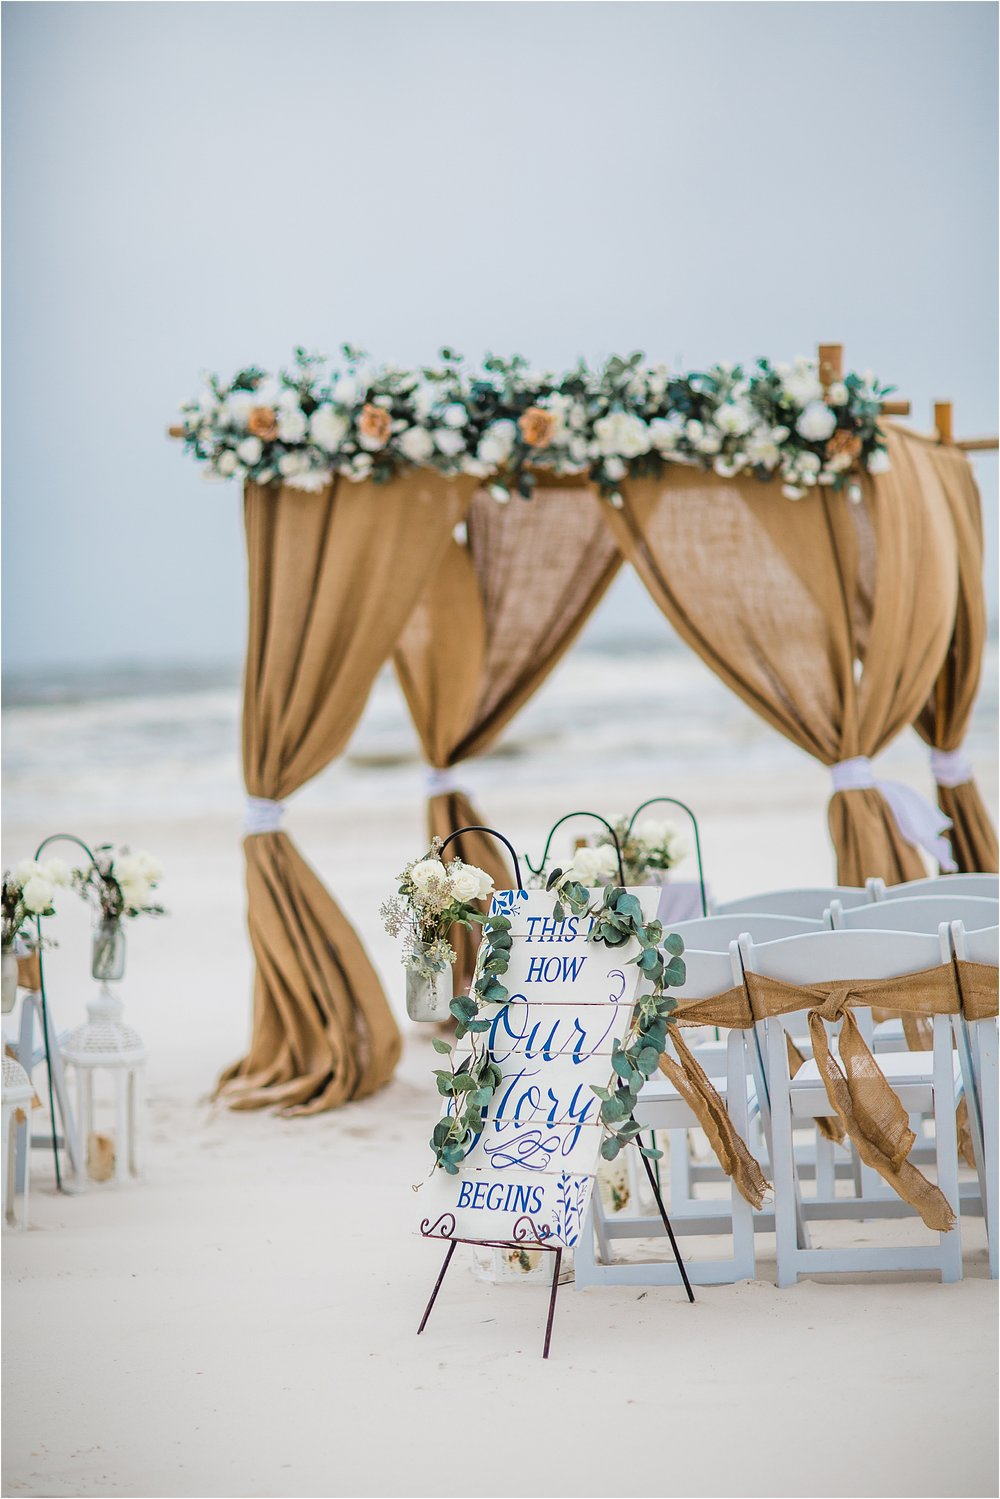 Wedding signs for Gulf Shores Weddings